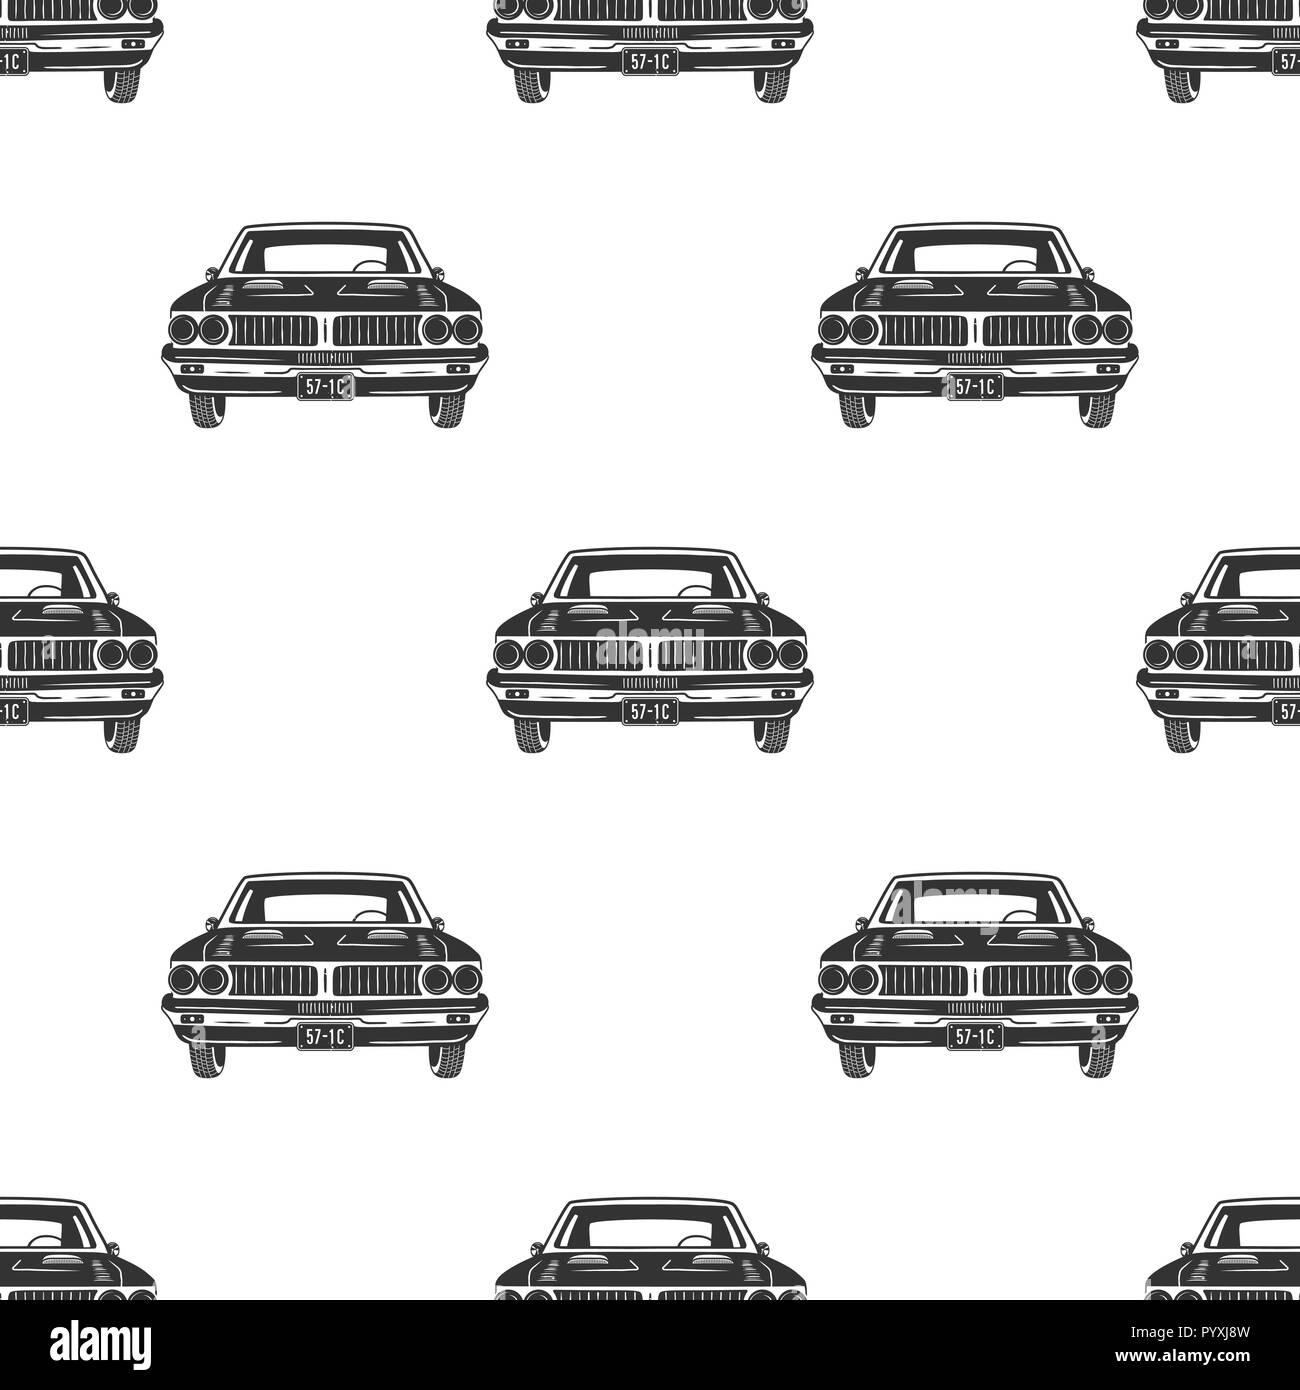 Retro Auto Seamless Vintage Car Pattern Background Automotive